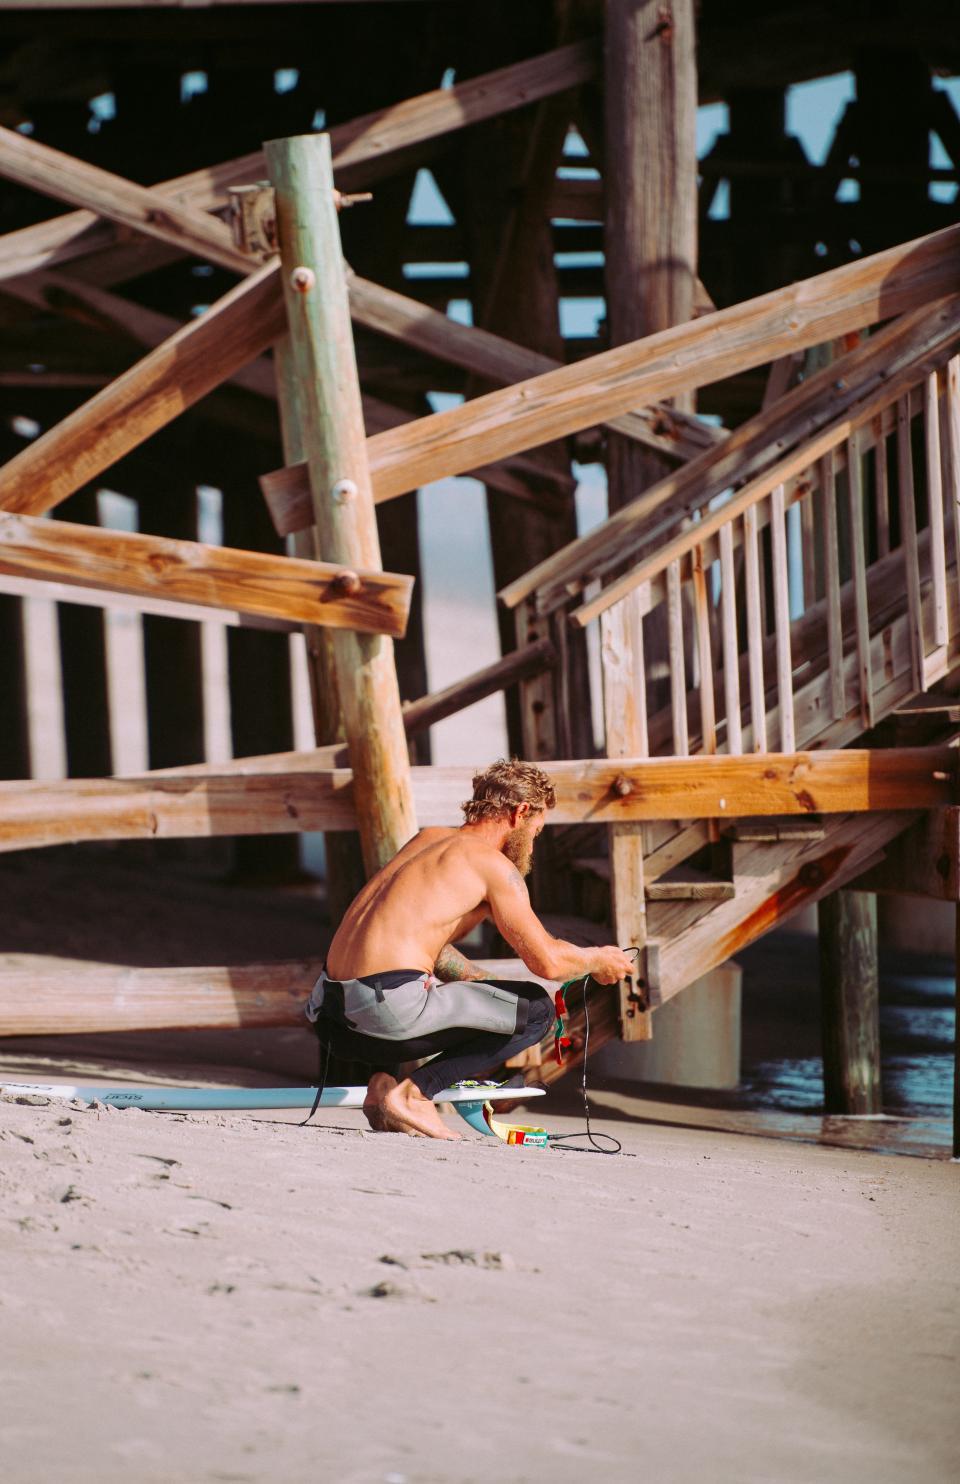 people, man, guy, work, building, cottage, wood, lumber, carpenter